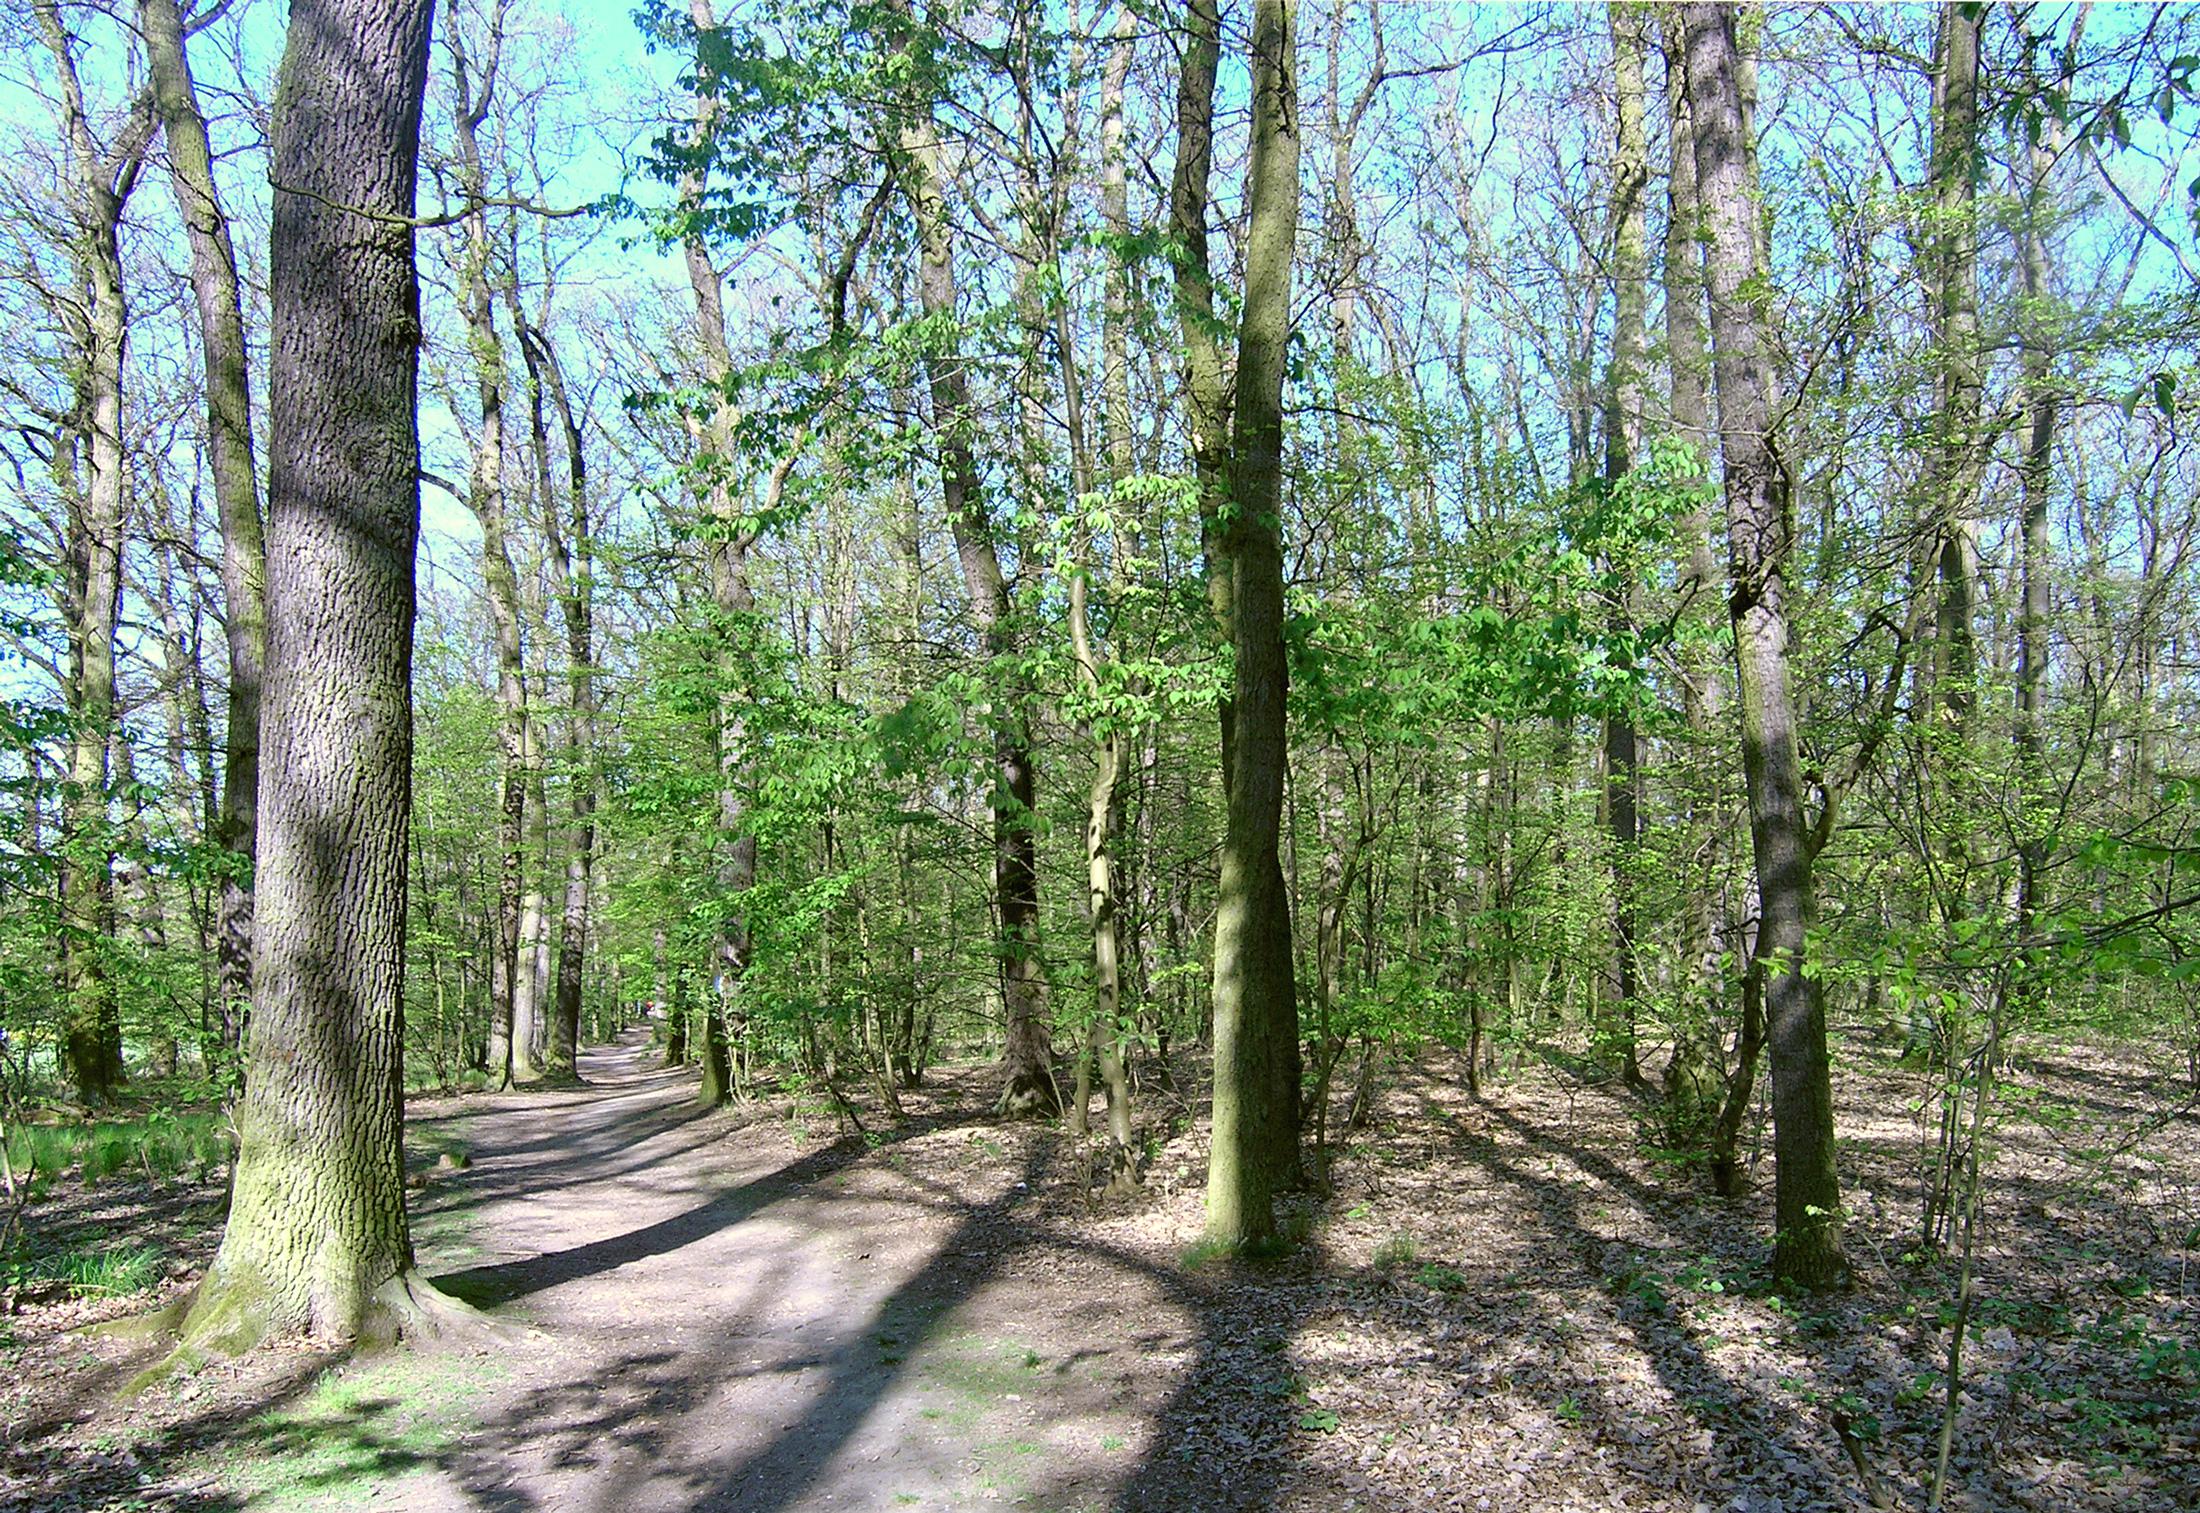 Milíčovský les (Czech Wikipedia user Packa, CC BY-SA 2.5 <https://creativecommons.org/licenses/by-sa/2.5>, via Wikimedia Commons)